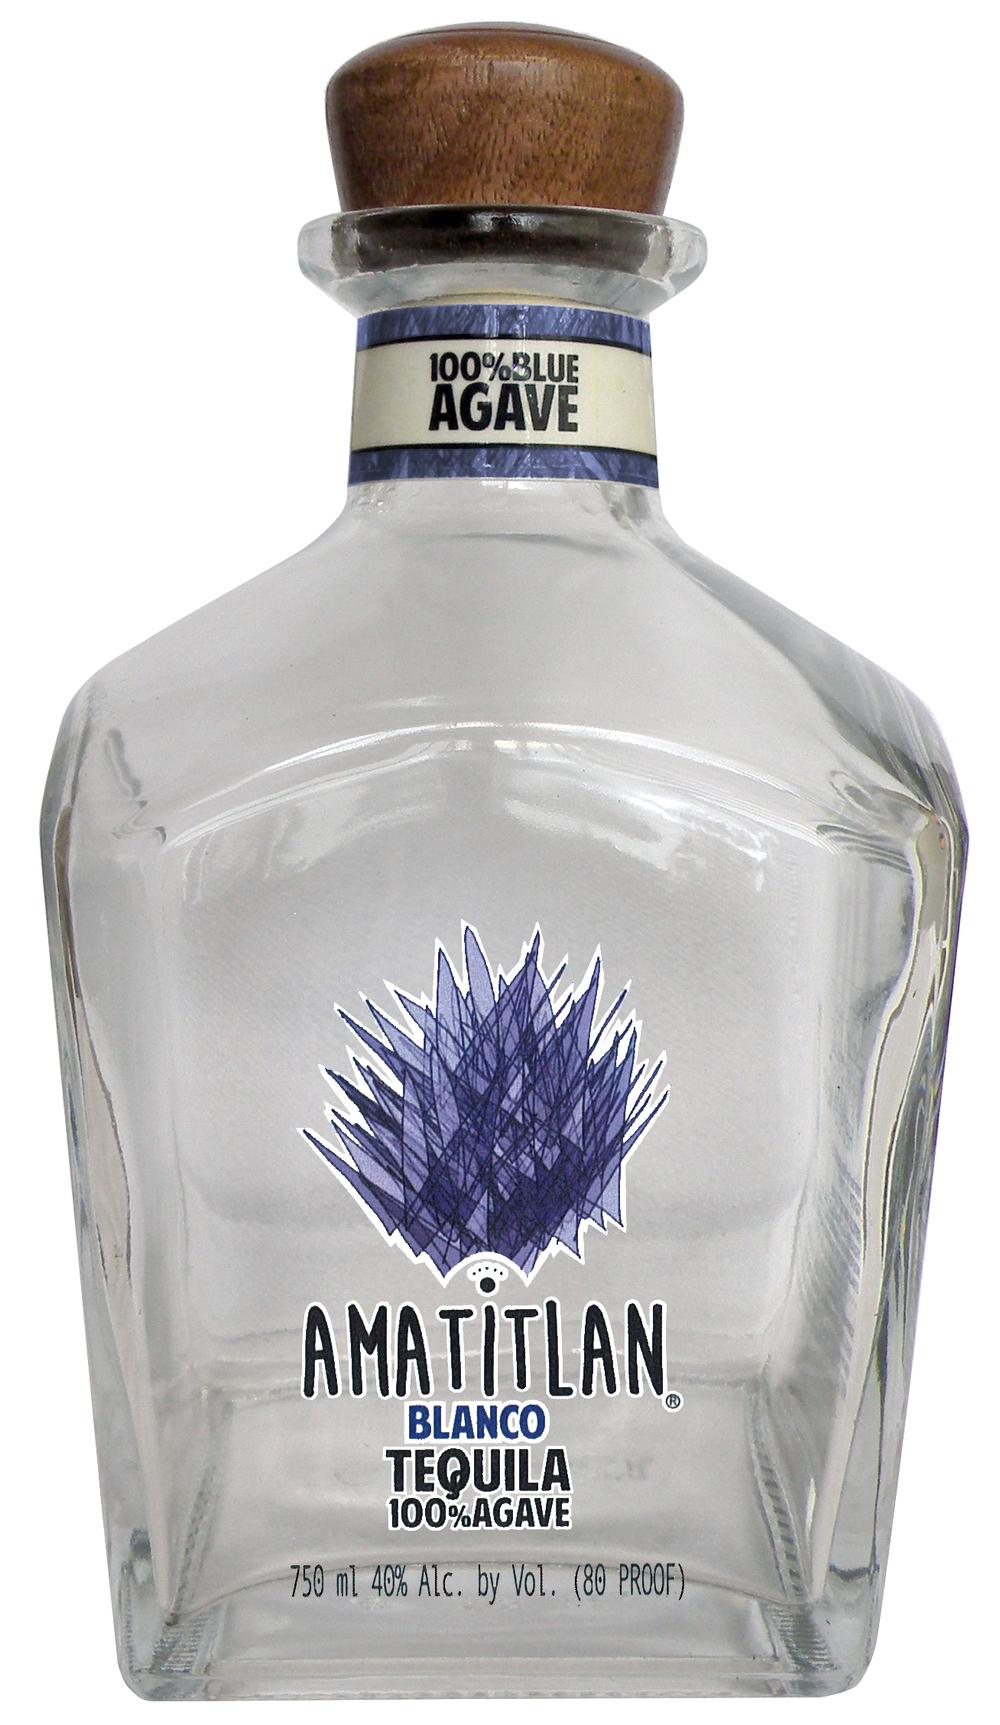 Tequila Amatitlan Blanco 750 ml £43.20